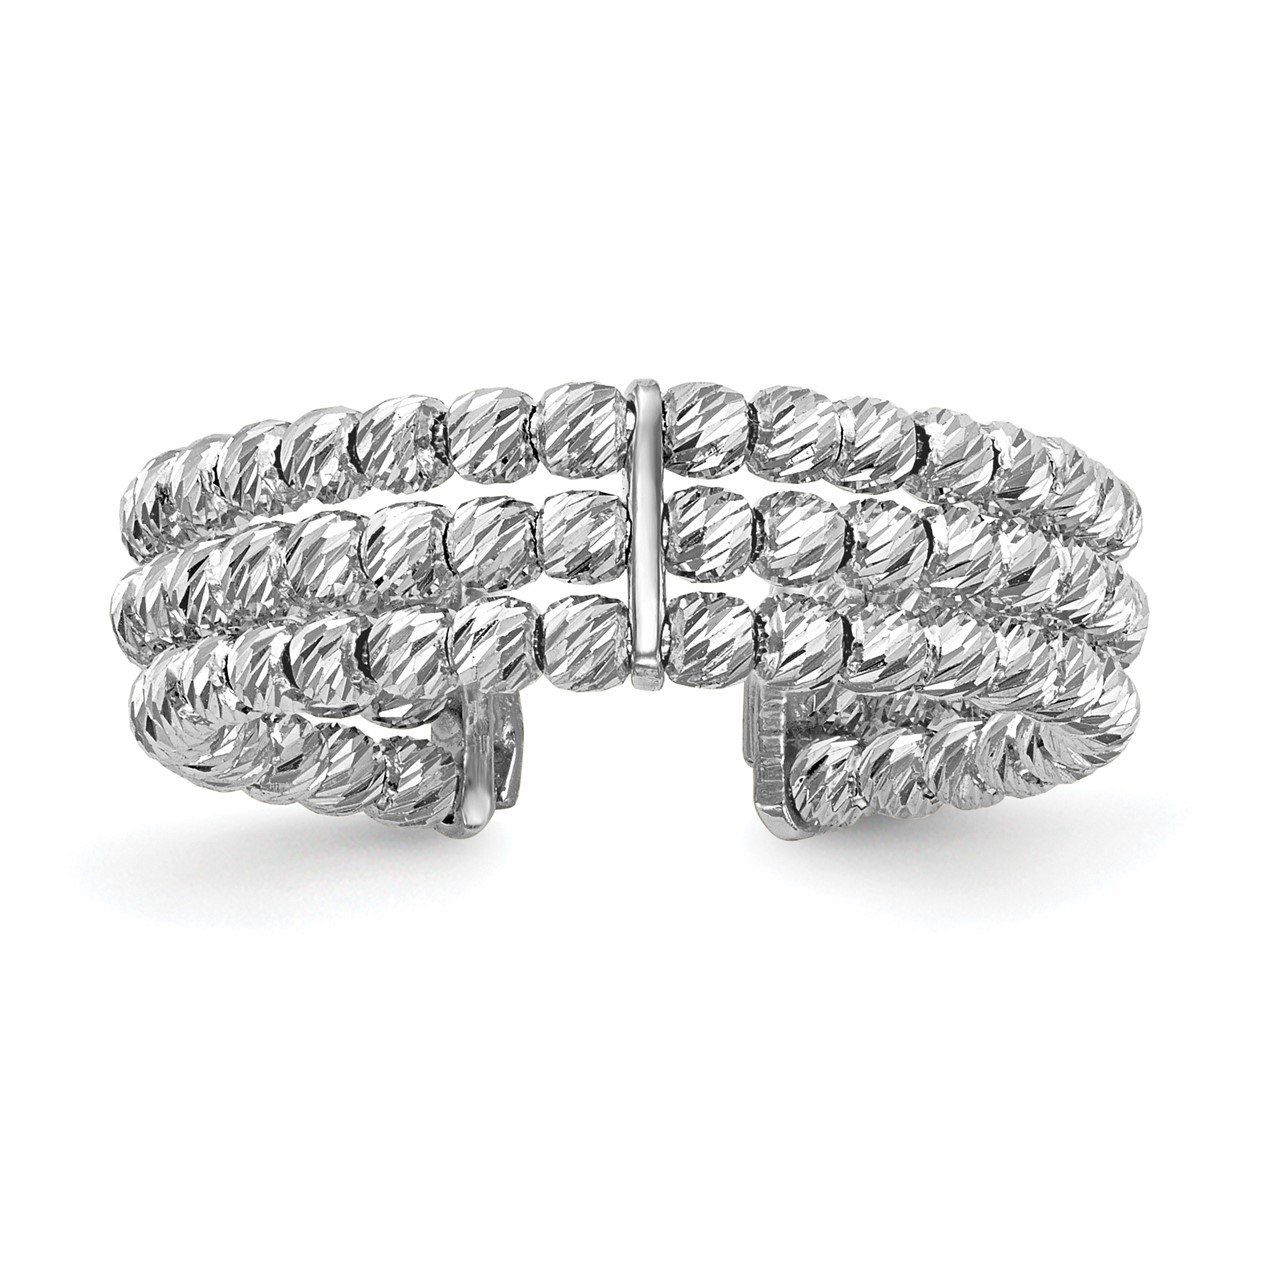 Leslie's 14K White Gold Polished D/C 3 Band Beaded Adjustable Ring